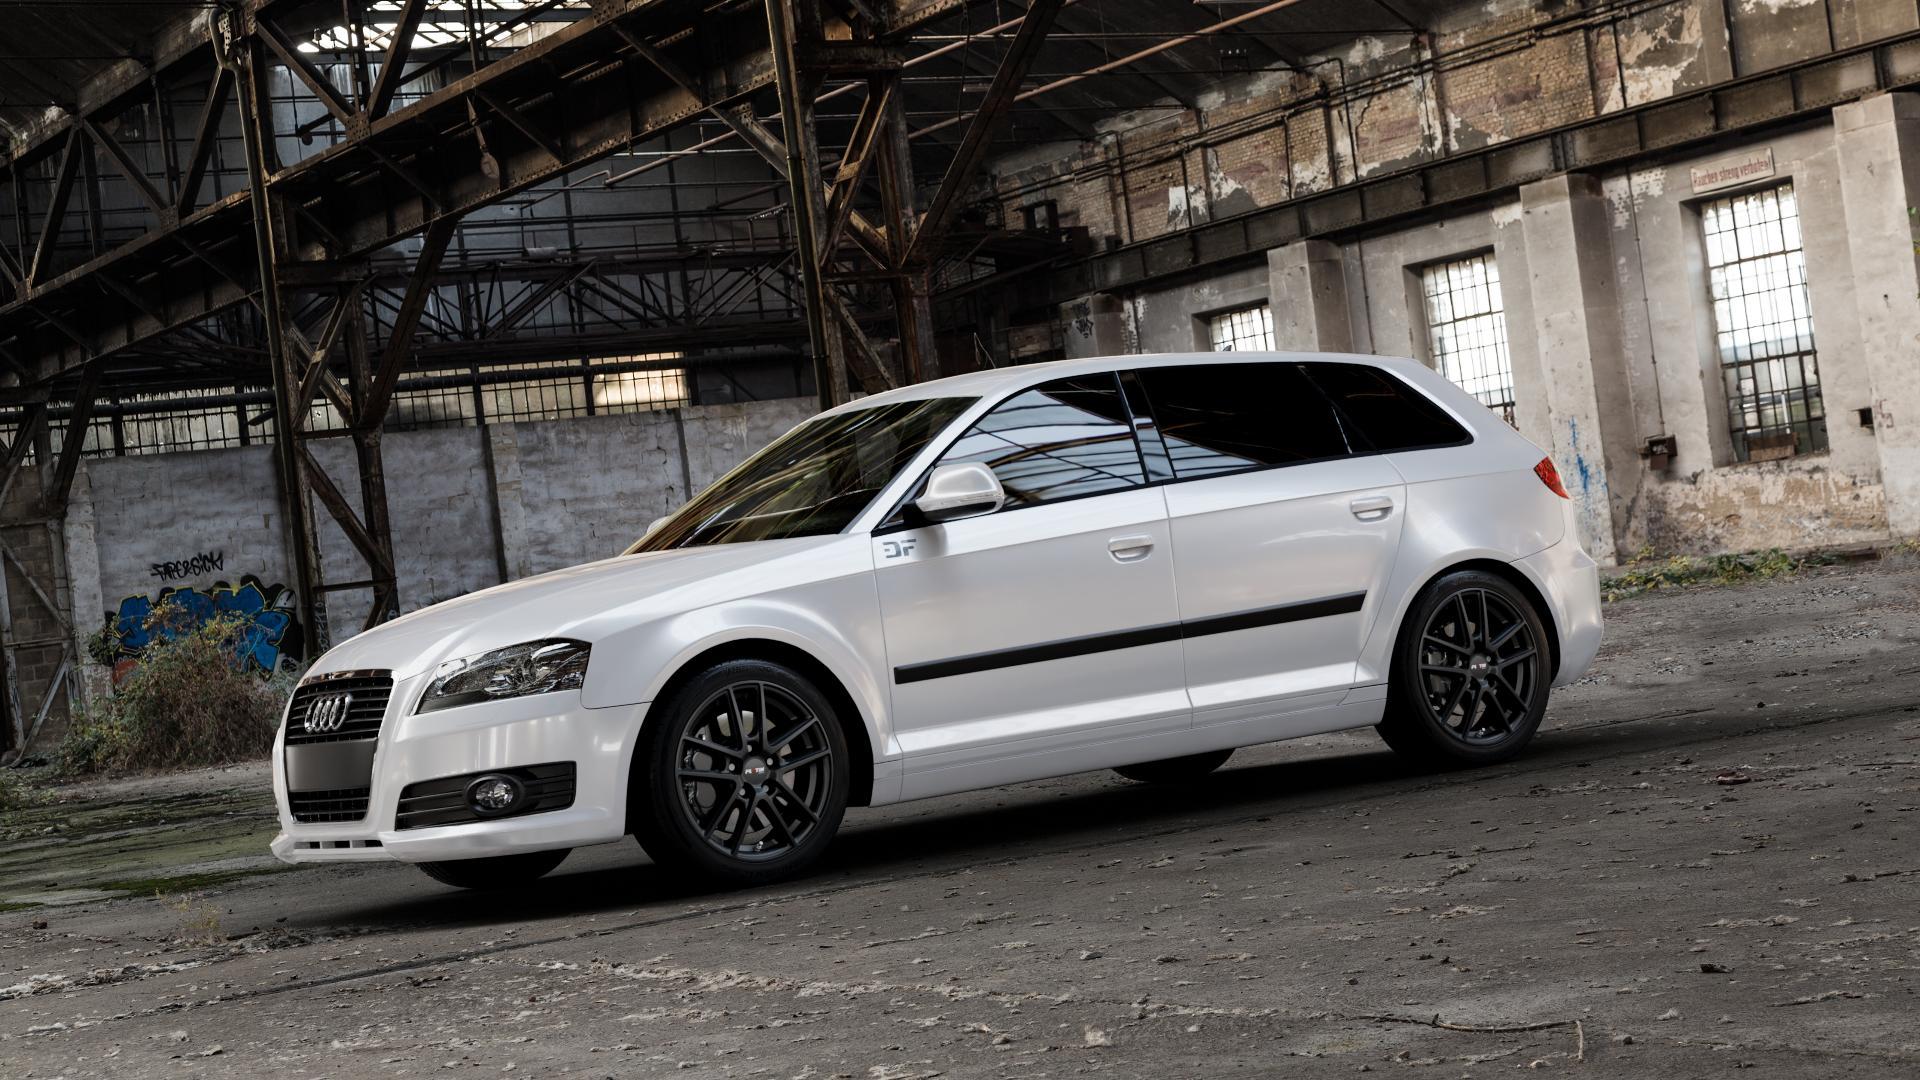 Platin Wheels P 73 racing-schwarz Felge mit Reifen in 17Zoll Winterfelge Alufelge auf weissem Audi A3 Typ 8P (Sportback) 1,6l 75kW (102 PS) 2,0l FSI 110kW (150 1,9l TDI 77kW (105 103kW (140 TFSI 147kW (200 85kW (116 100kW (136 1,8l 118kW (160 125kW (170 1,4l 92kW (125 120kW (163 quattro 3,2l V6 184kW (250 S3 195kW (265 1,2l 66kW (90 18